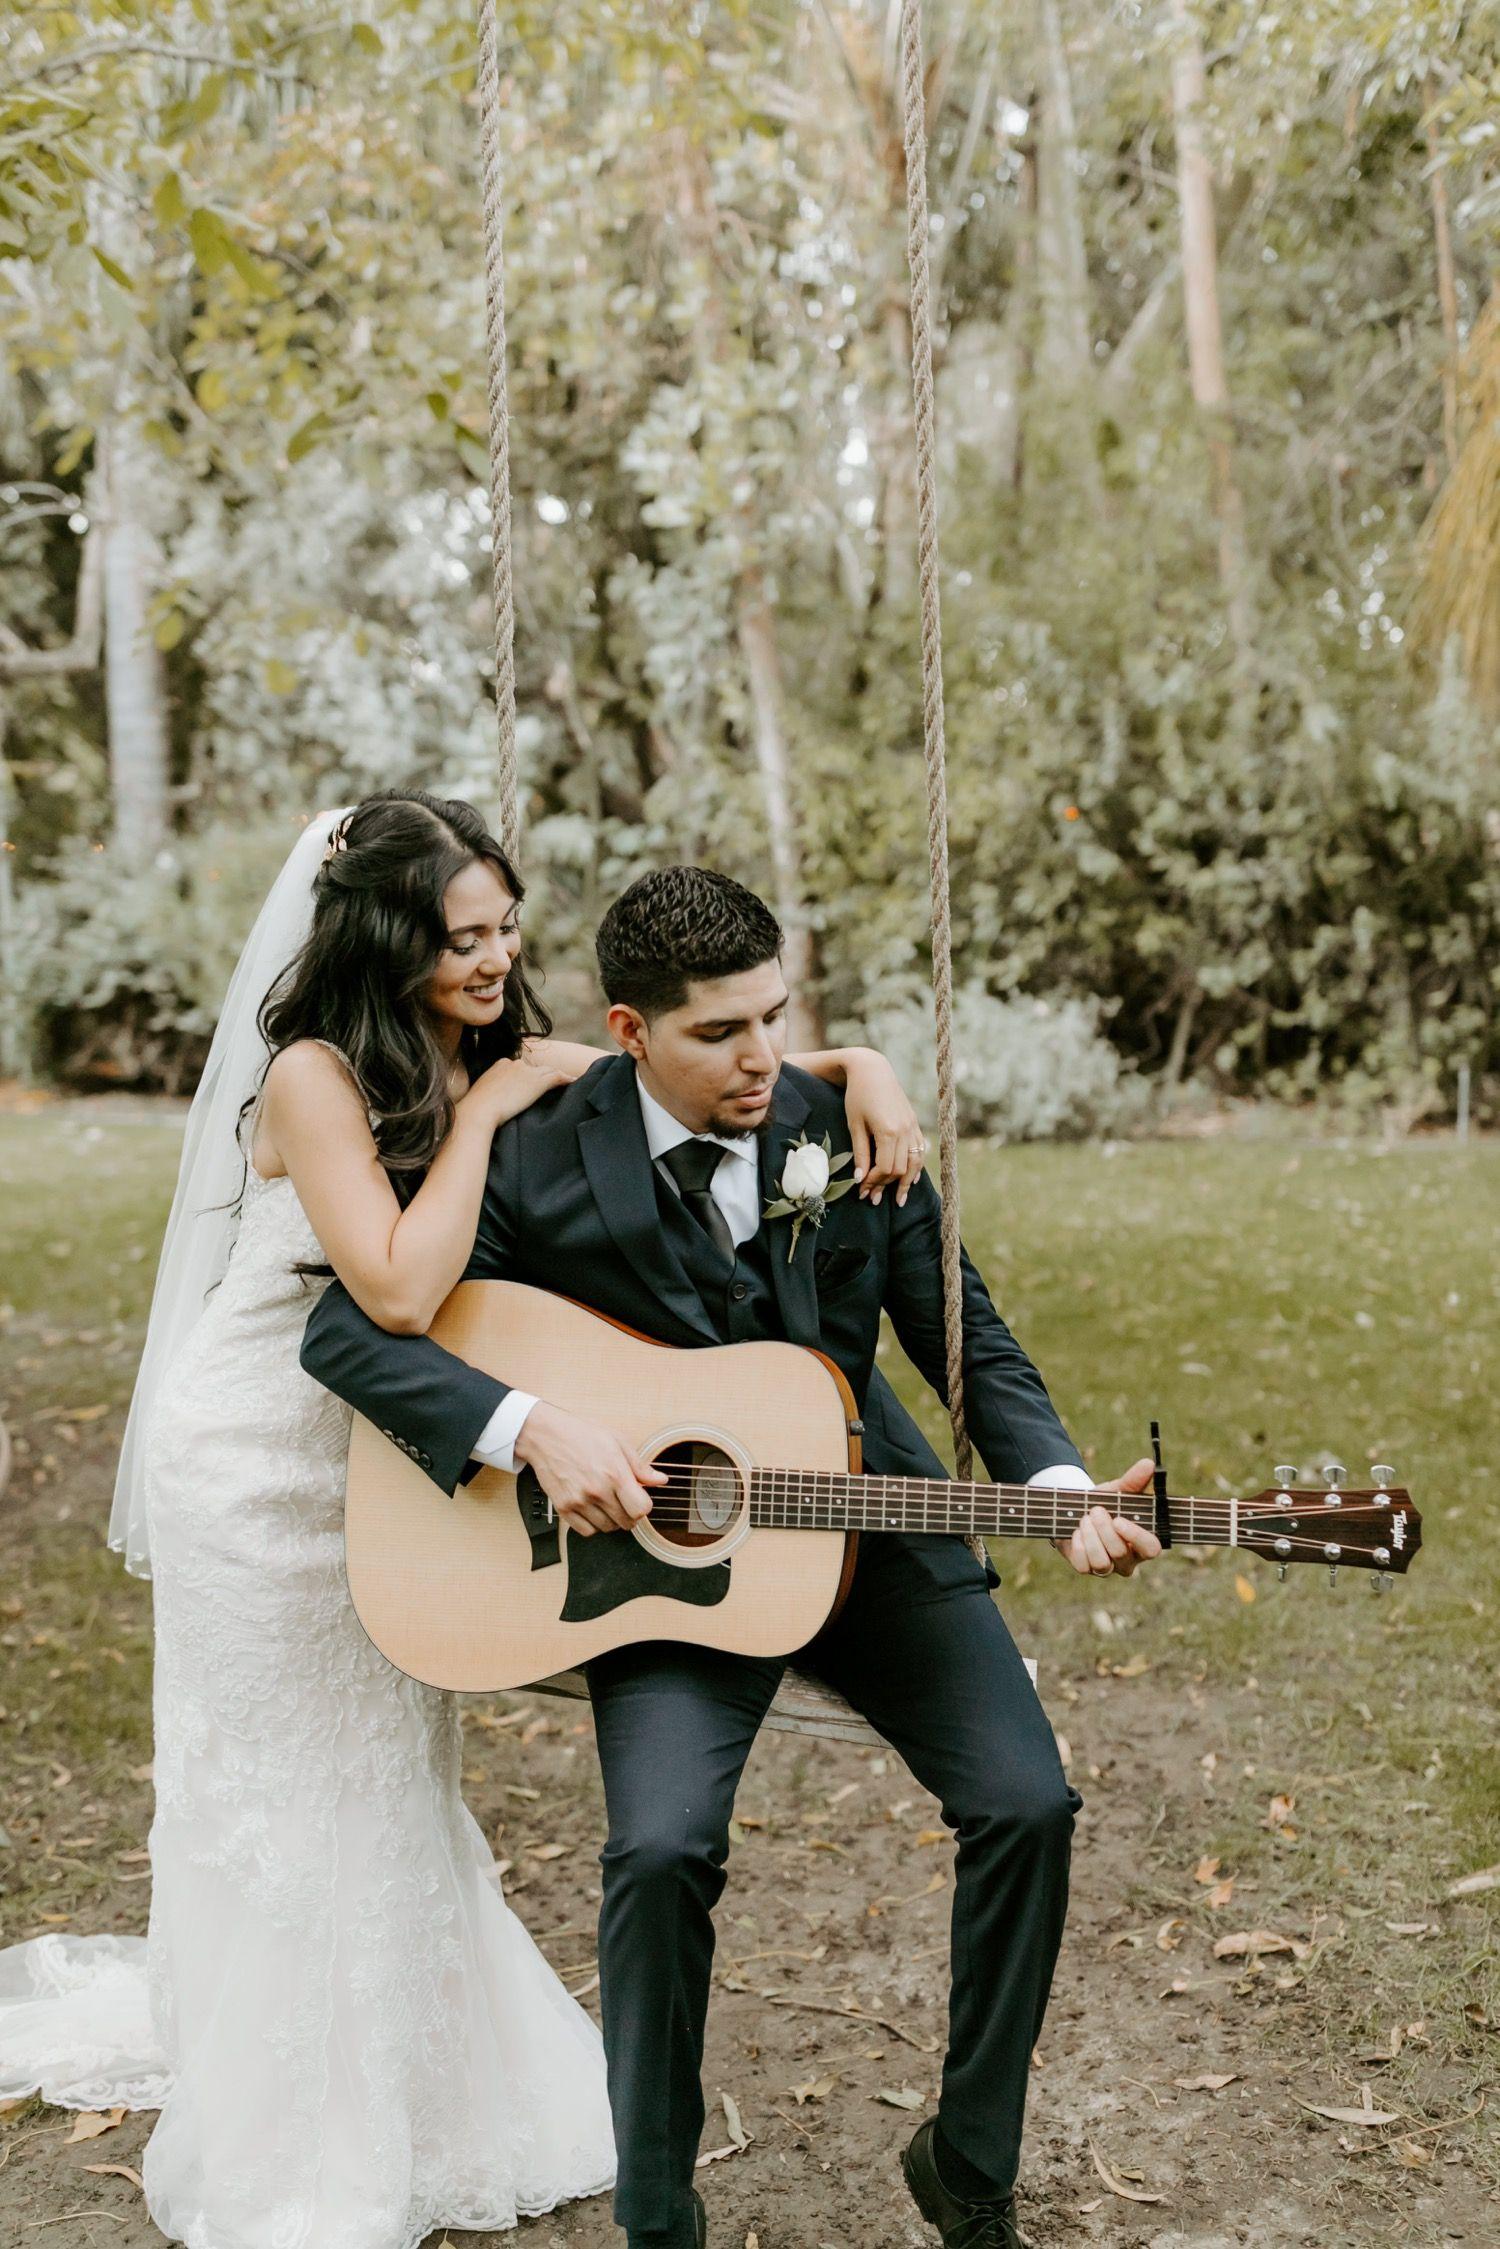 bridal photos during wedding day southern california ...